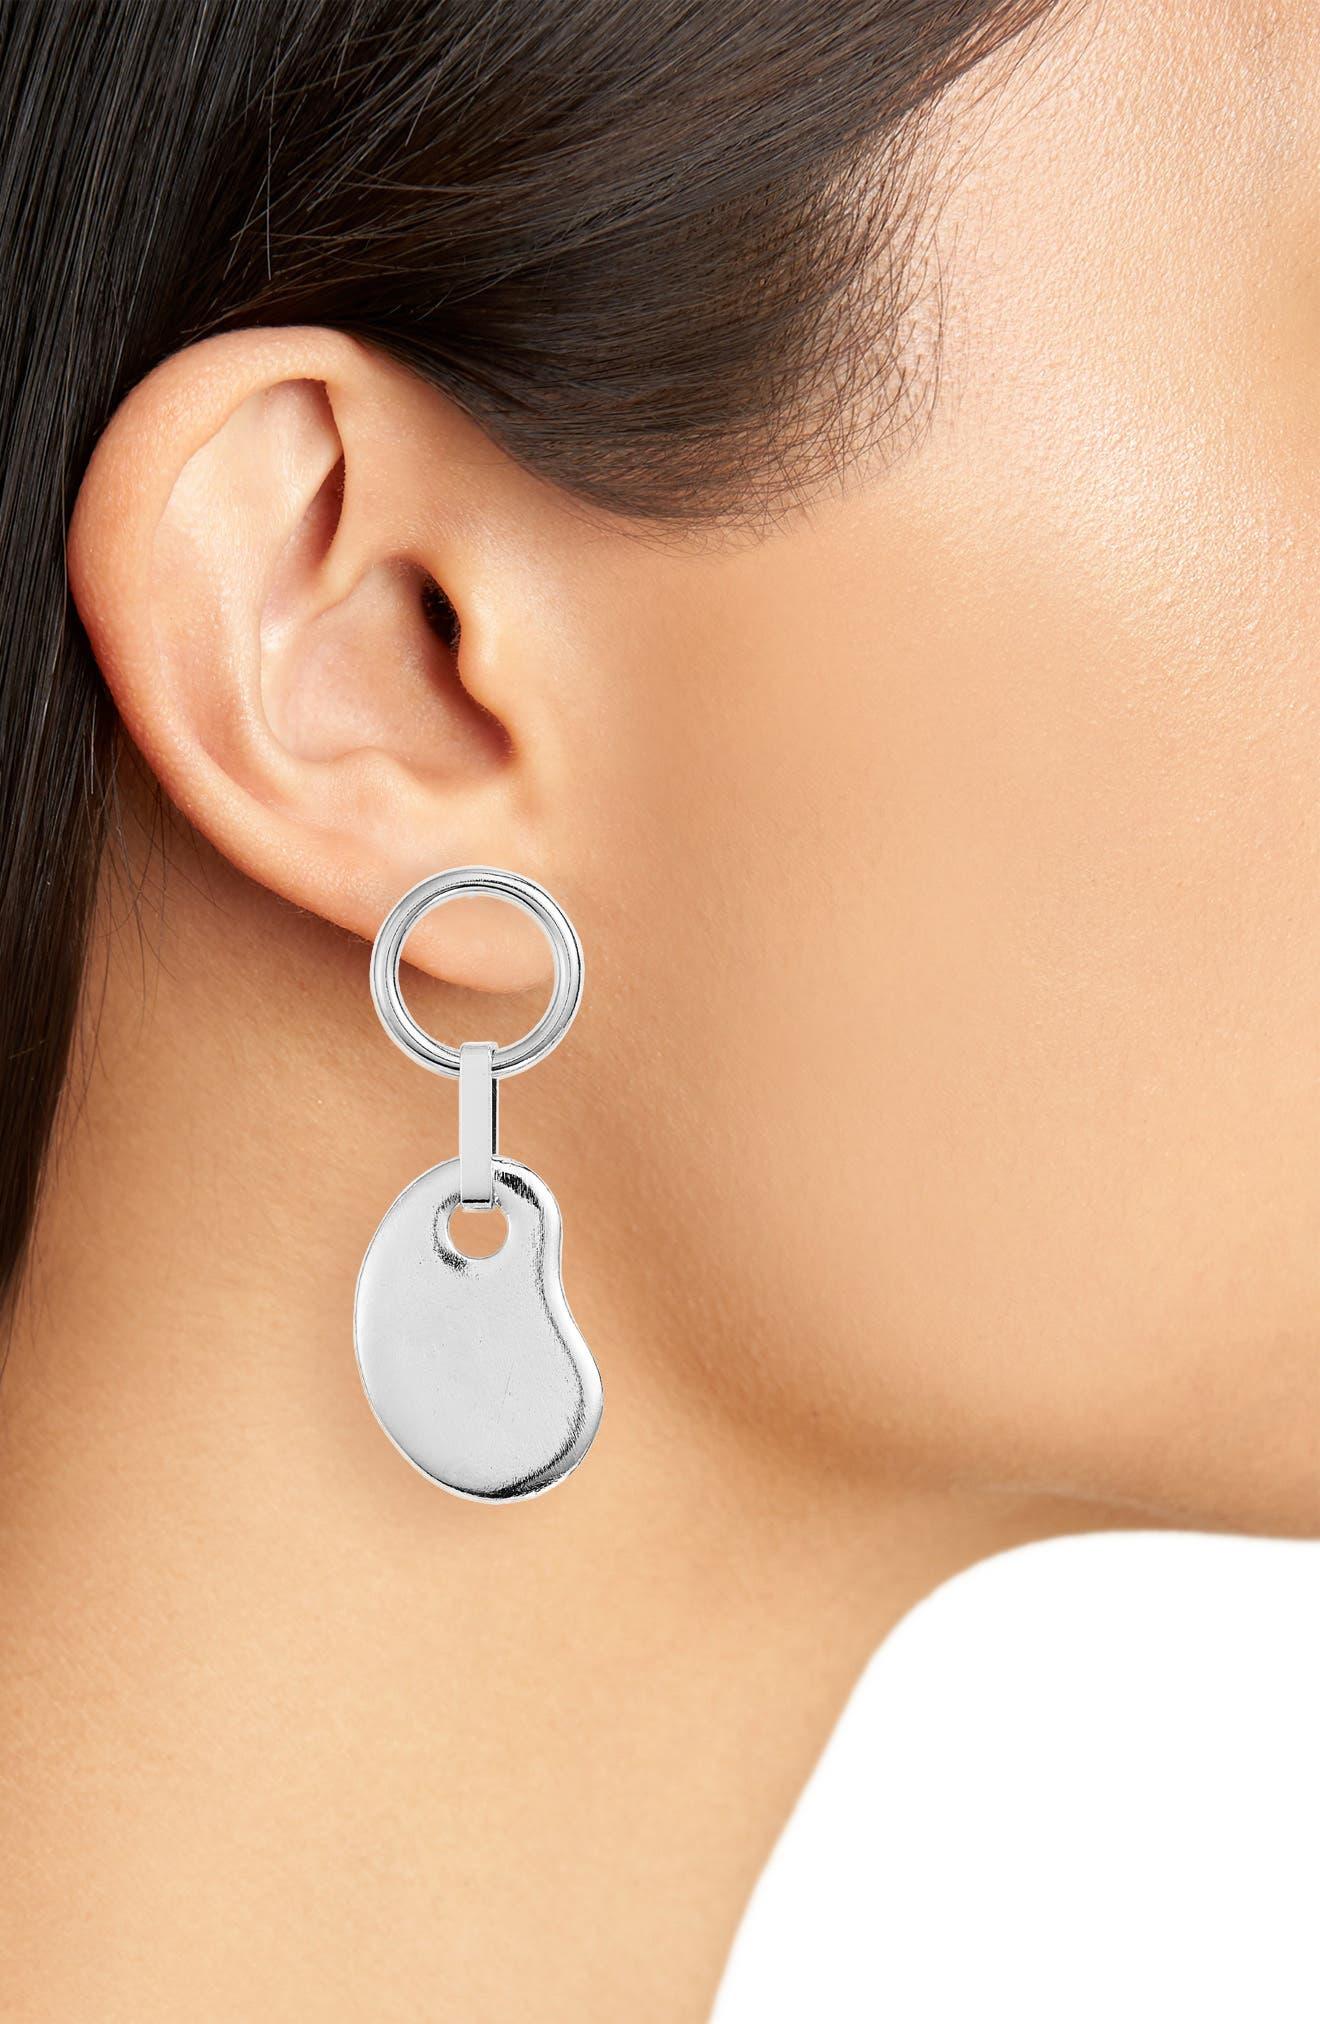 Amoeba Ring Drop Earrings,                             Alternate thumbnail 2, color,                             SILVER